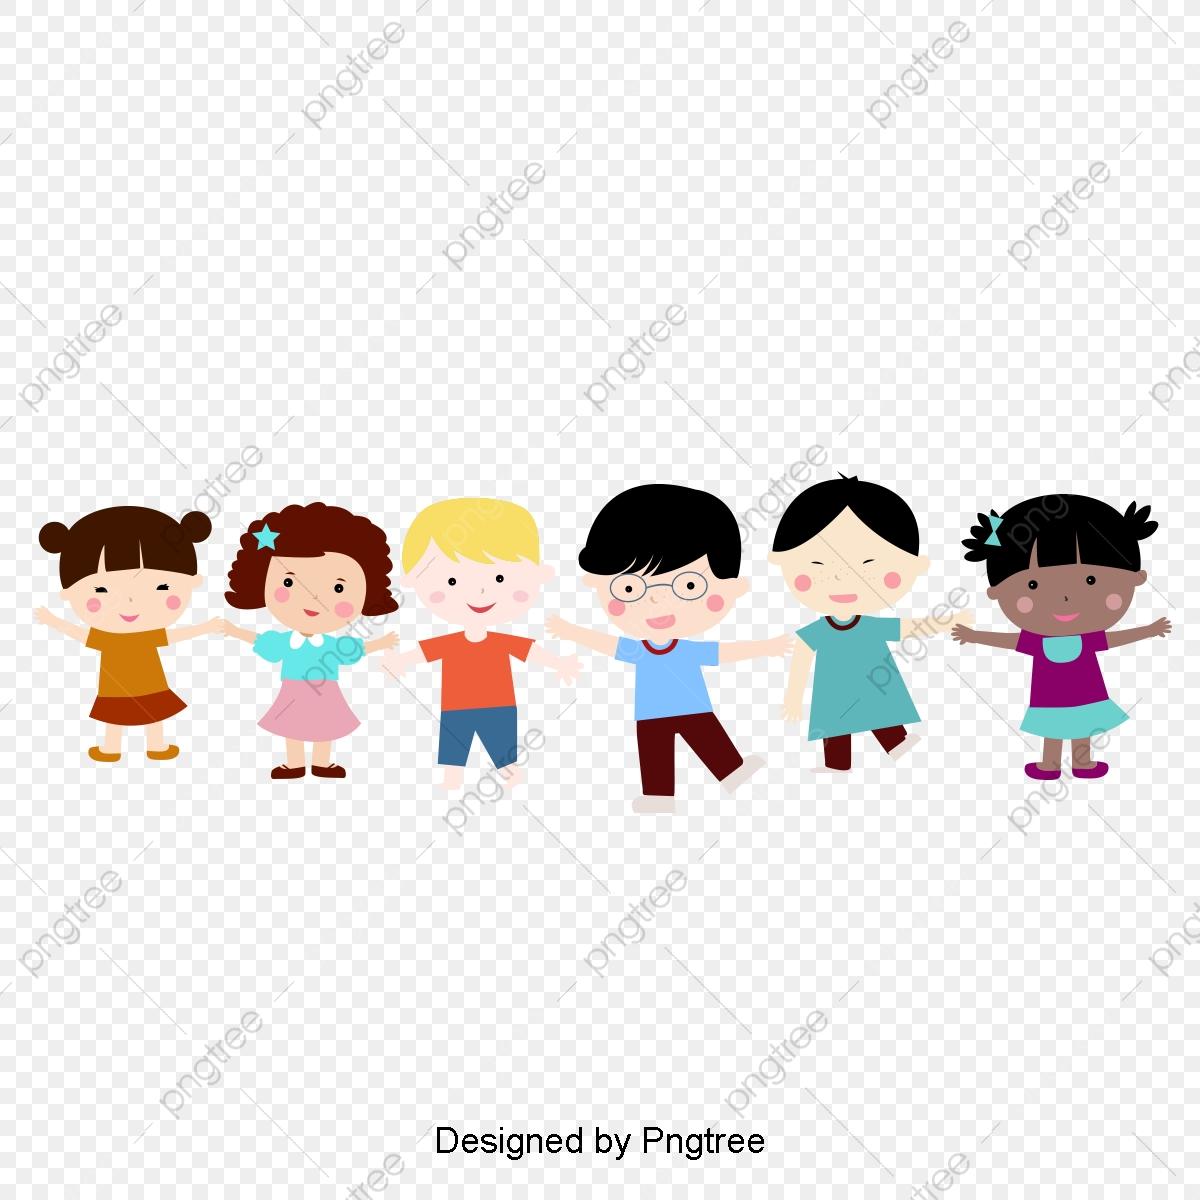 Toddler clipart nice kid. Cartoon children holding hands